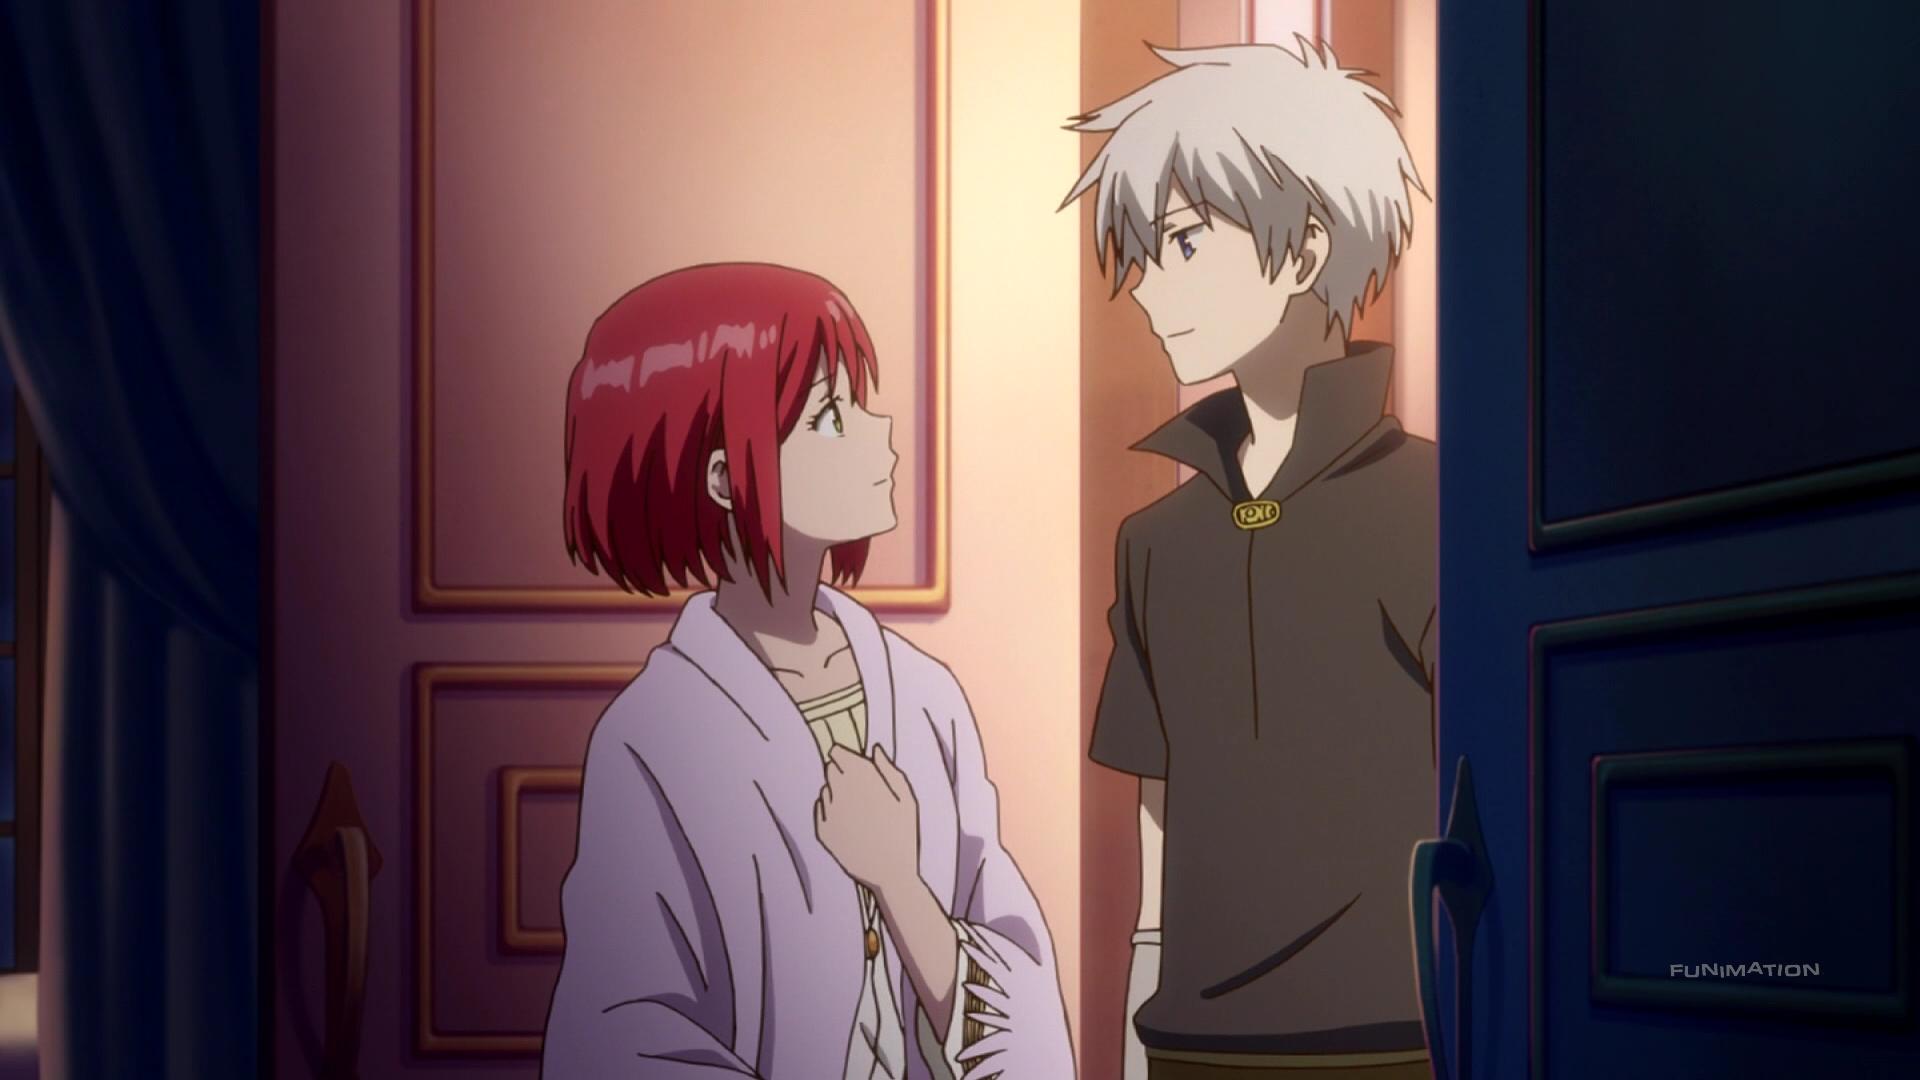 Kết quả hình ảnh cho Akagami no Shirayuki-hime Season 2 (Snow White with the Red Hair 2)